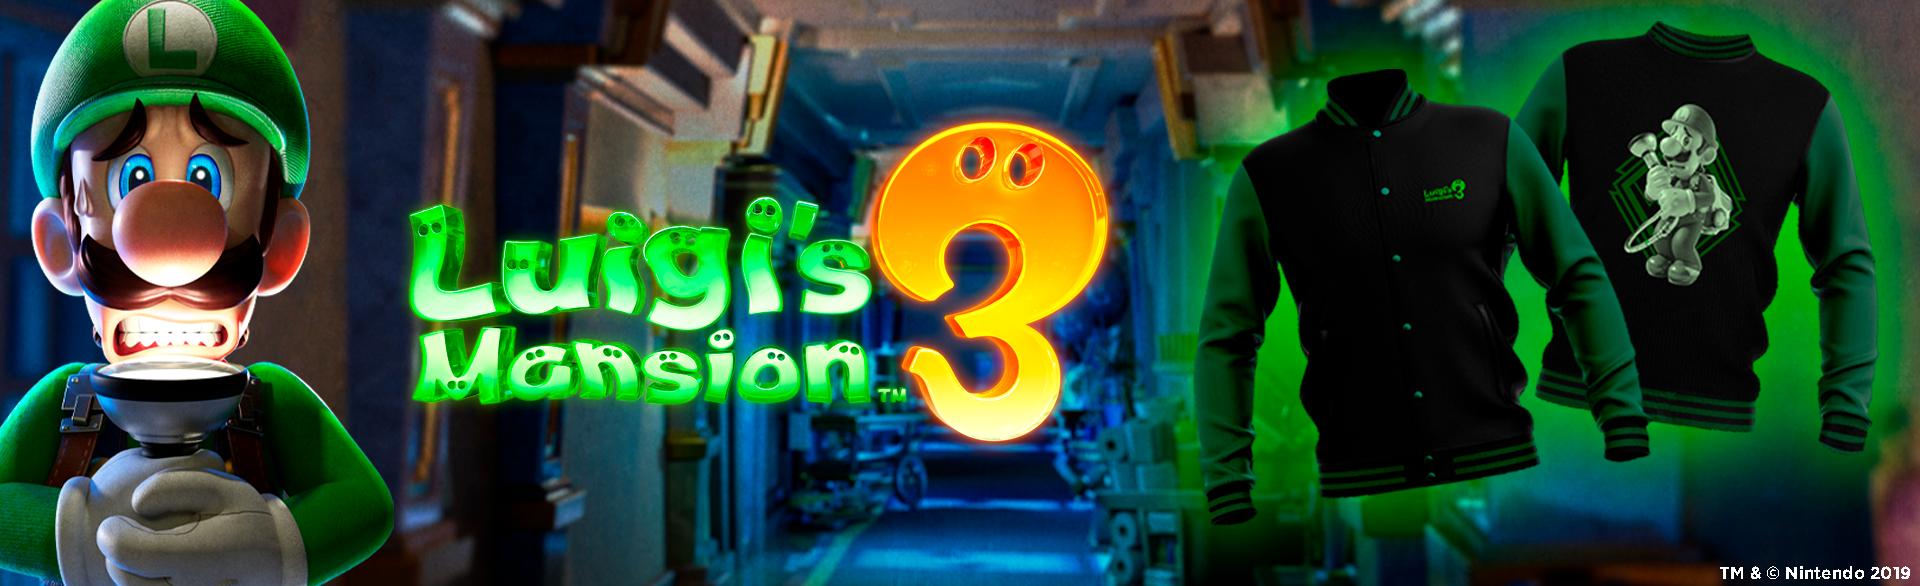 Luigi Mansion 3 Collection